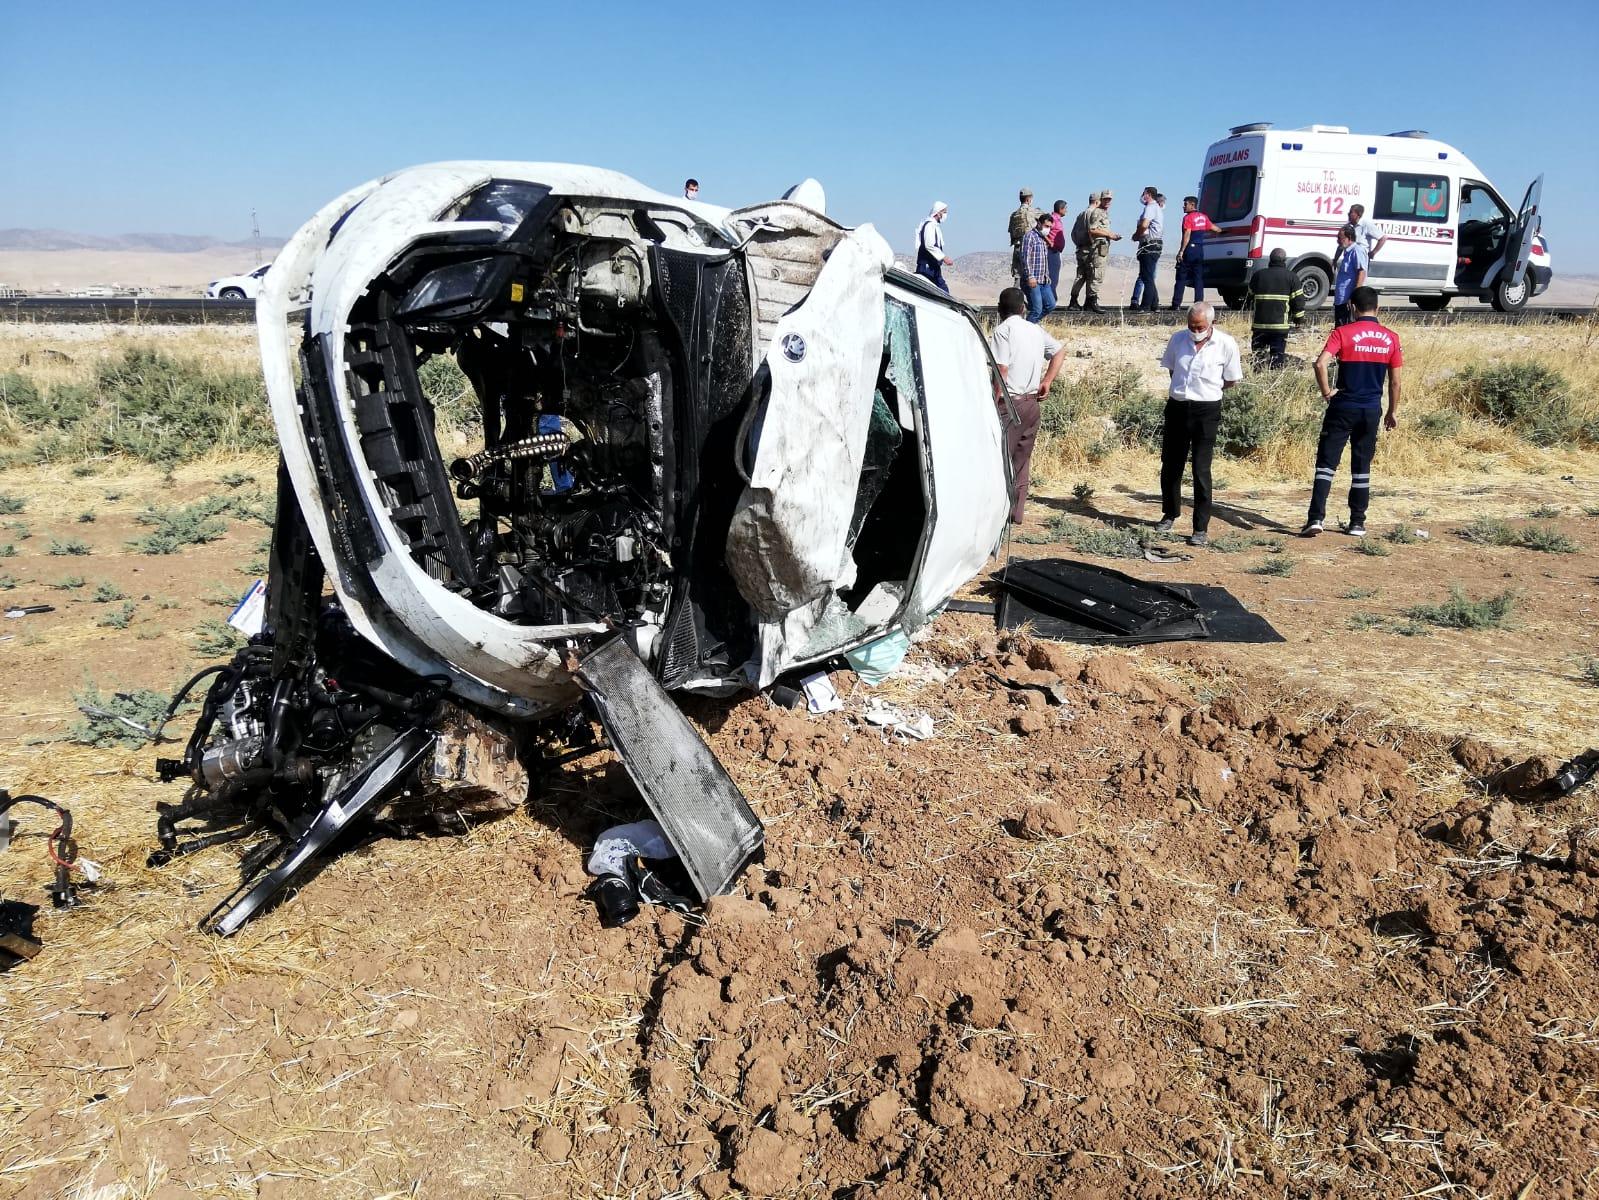 Otomobil takla attı, sürücü ağır yaralandı